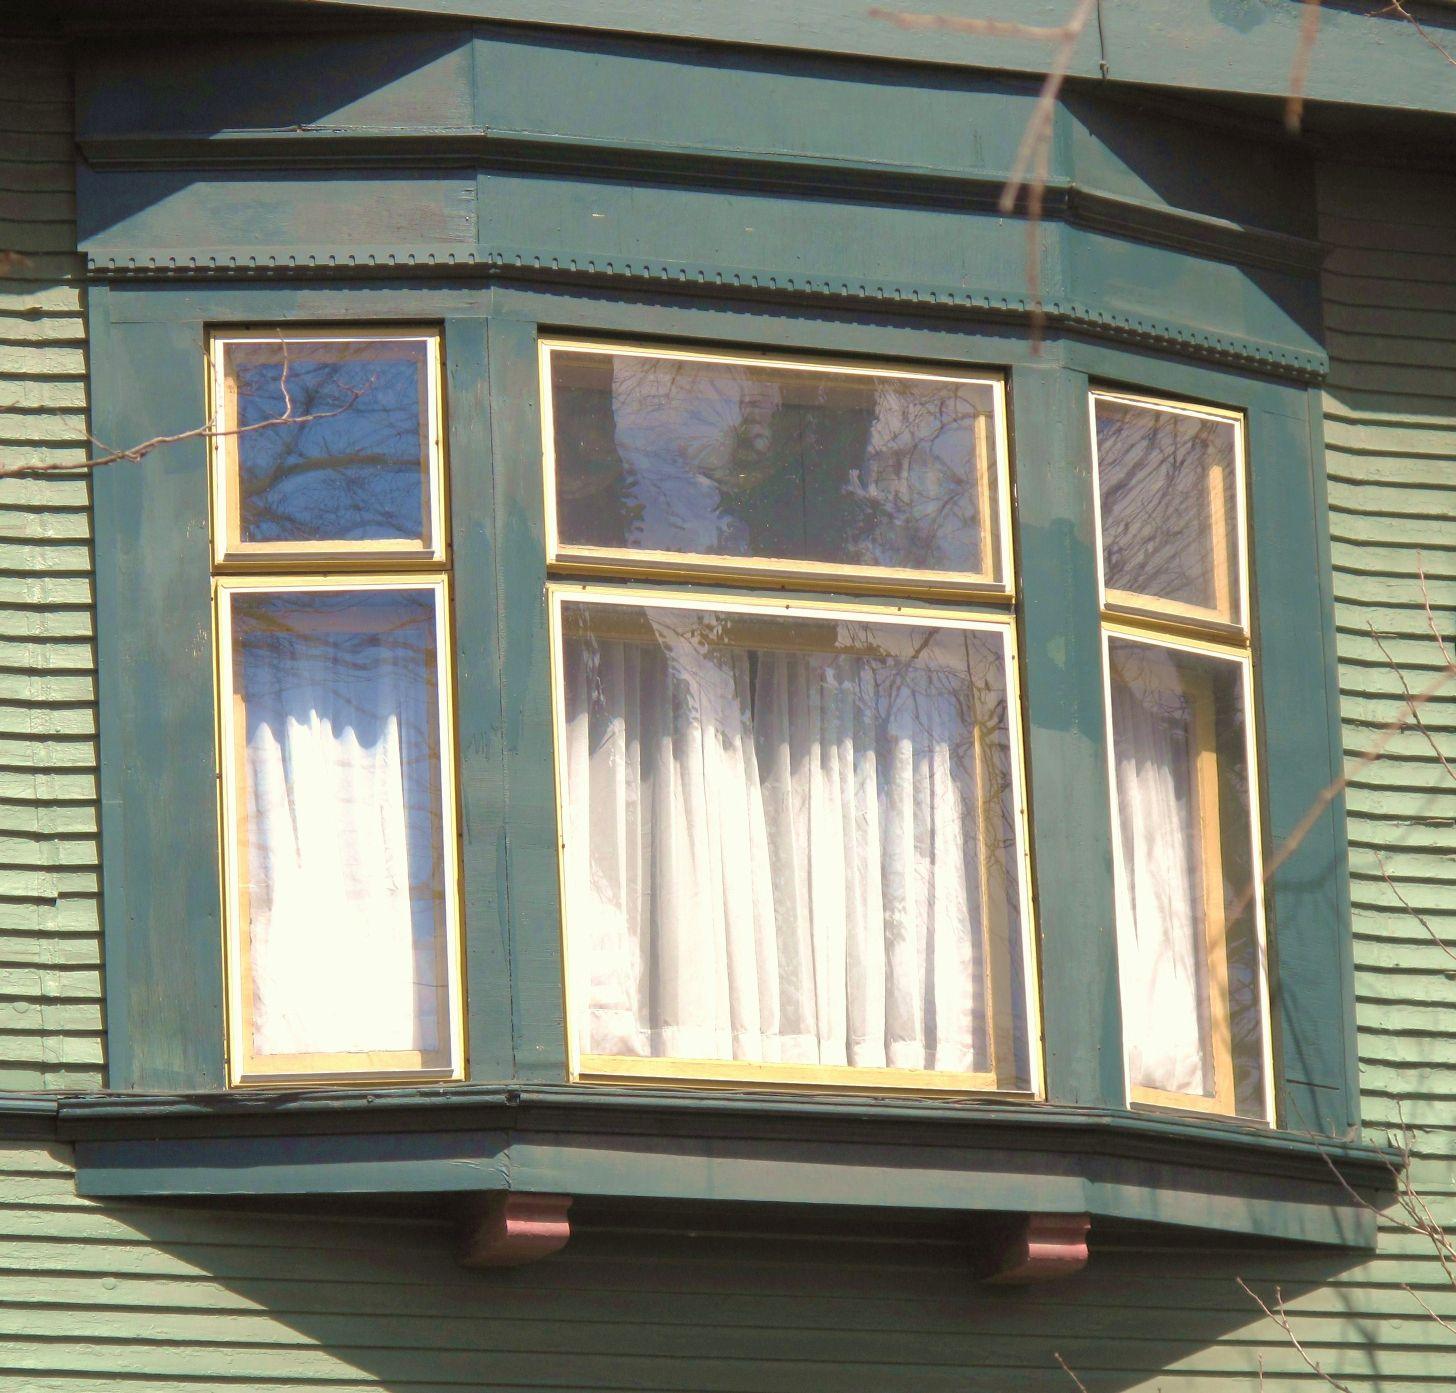 Building Language: Oriel Window